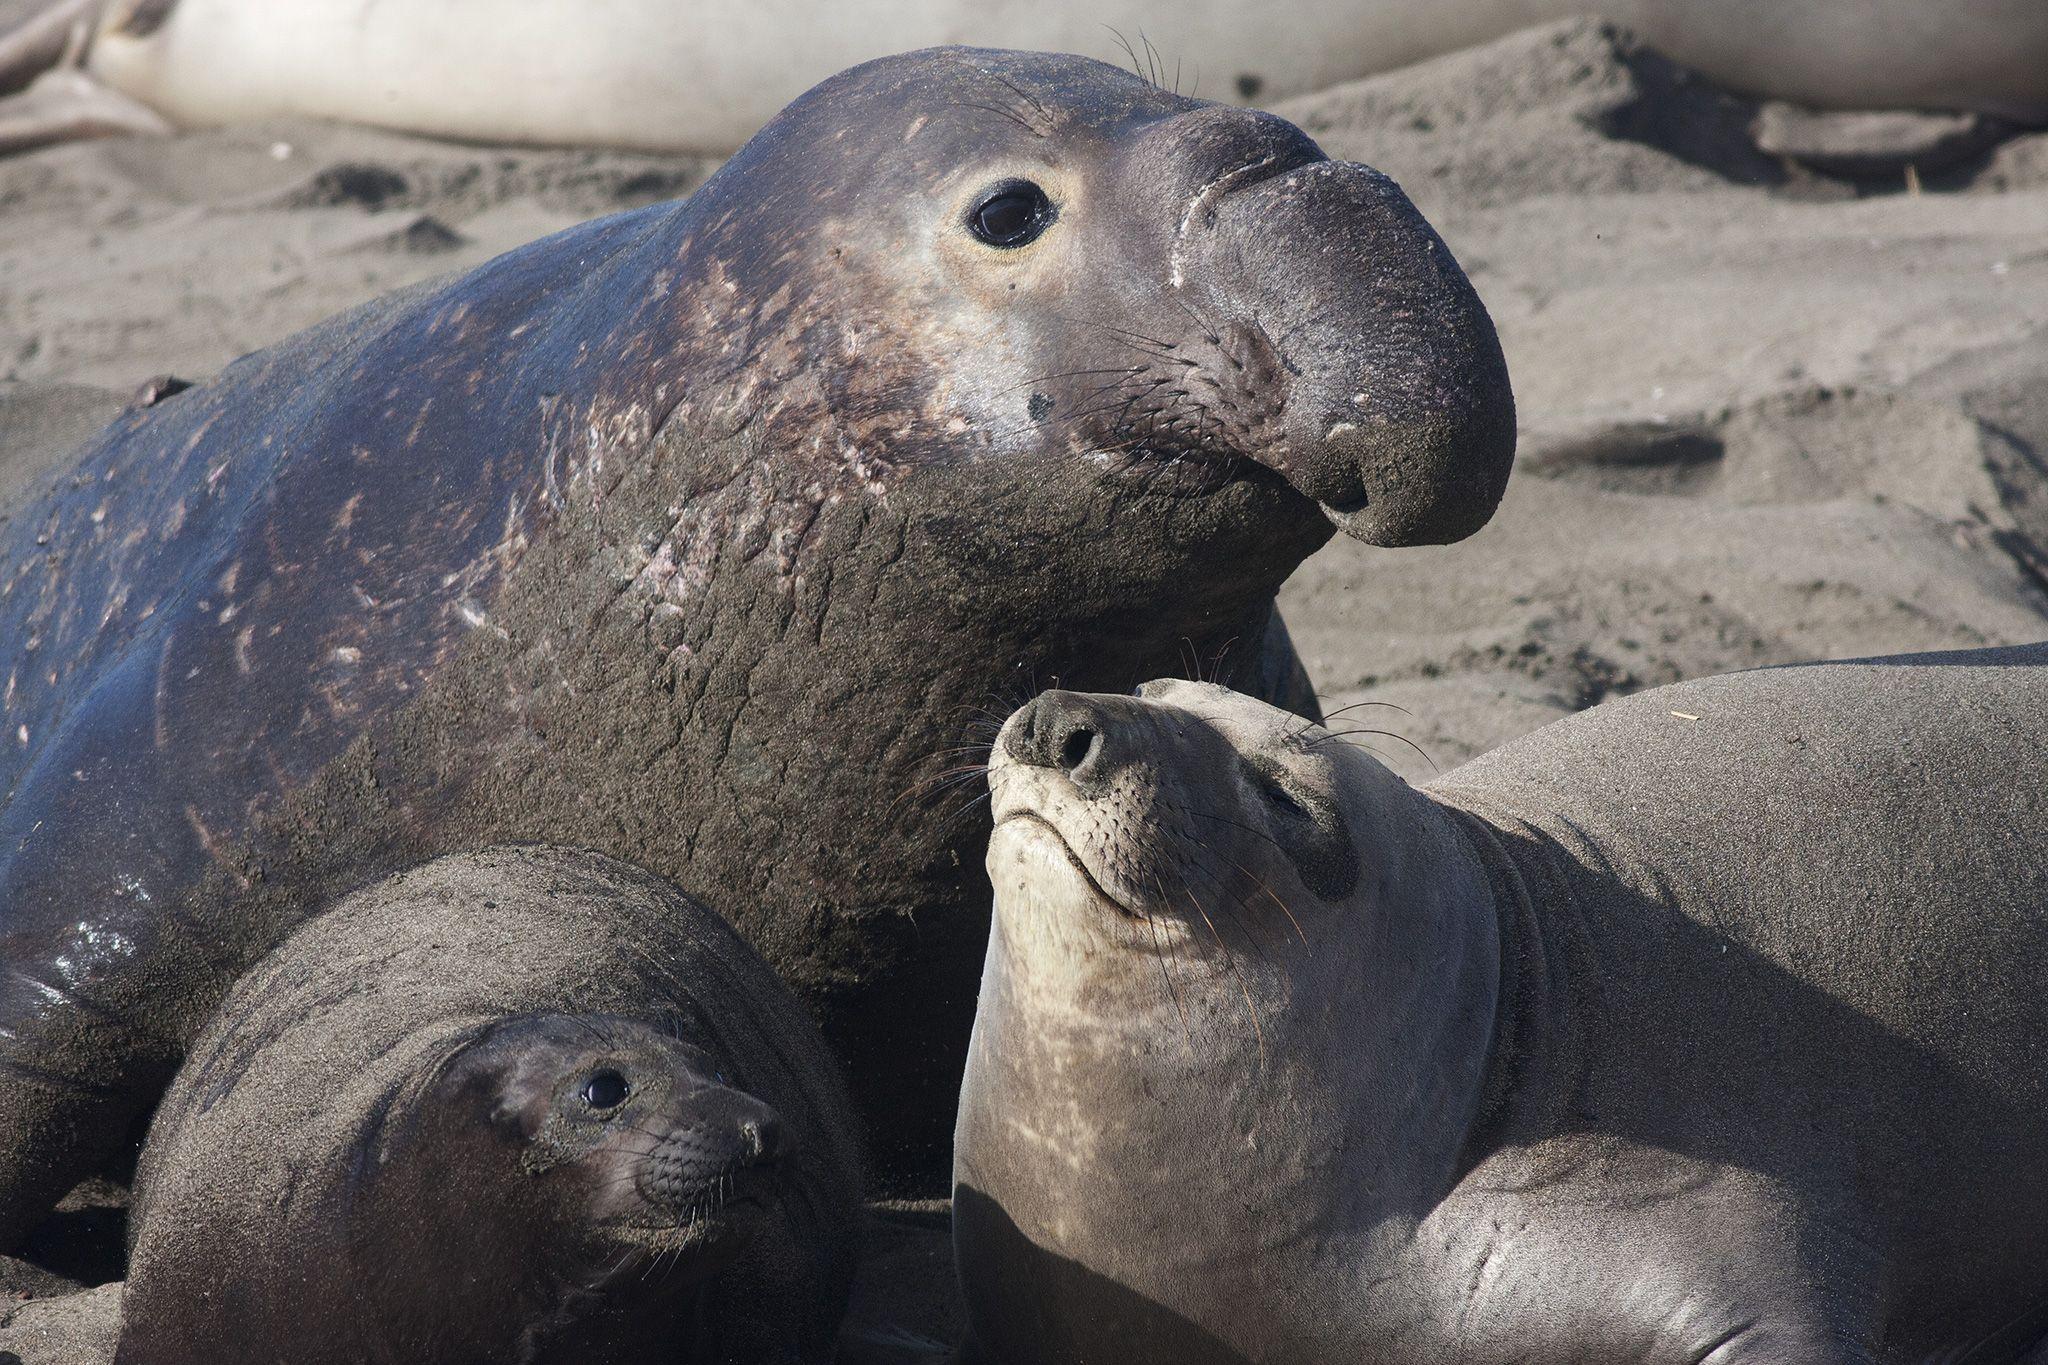 Cute Baby Seals Wallpapers Seals Animal Wallpapers Wallpaper Cave